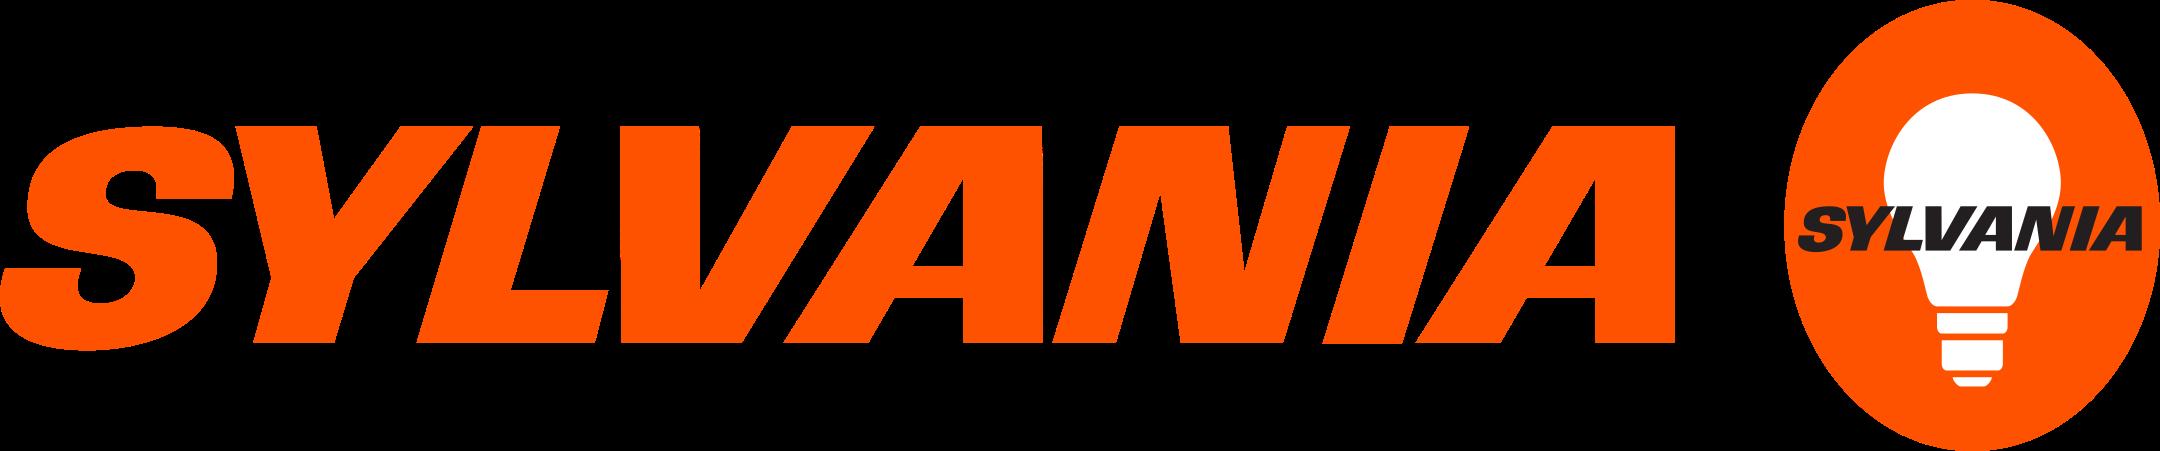 sylvania logo 1 - Sylvania Lighting Logo